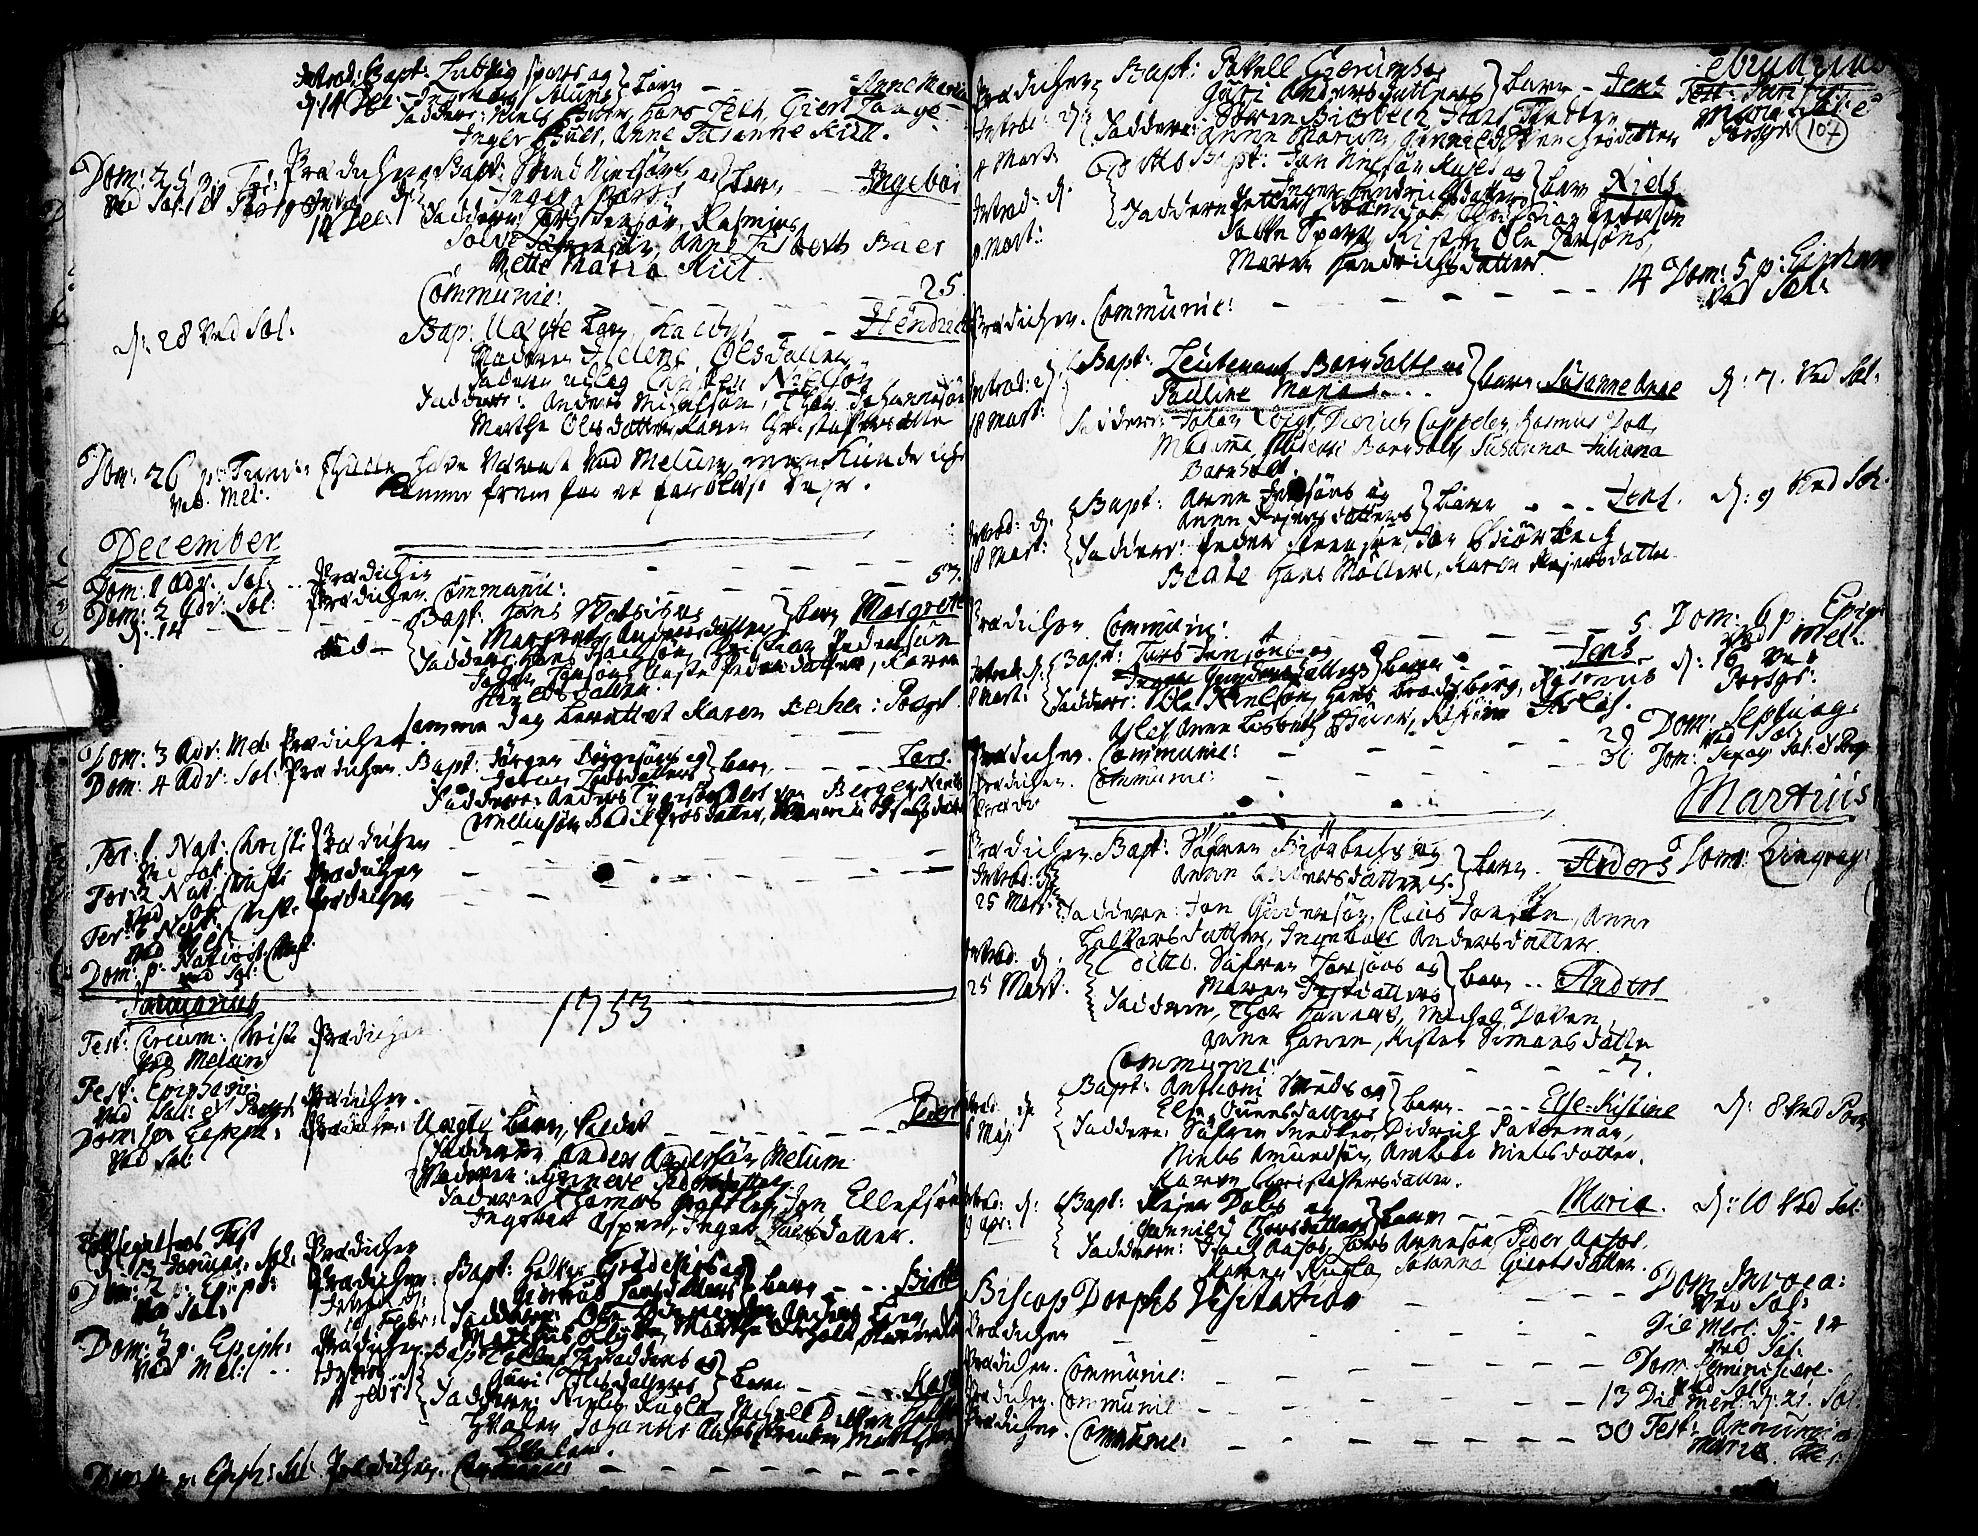 SAKO, Solum kirkebøker, F/Fa/L0002: Ministerialbok nr. I 2, 1713-1761, s. 107